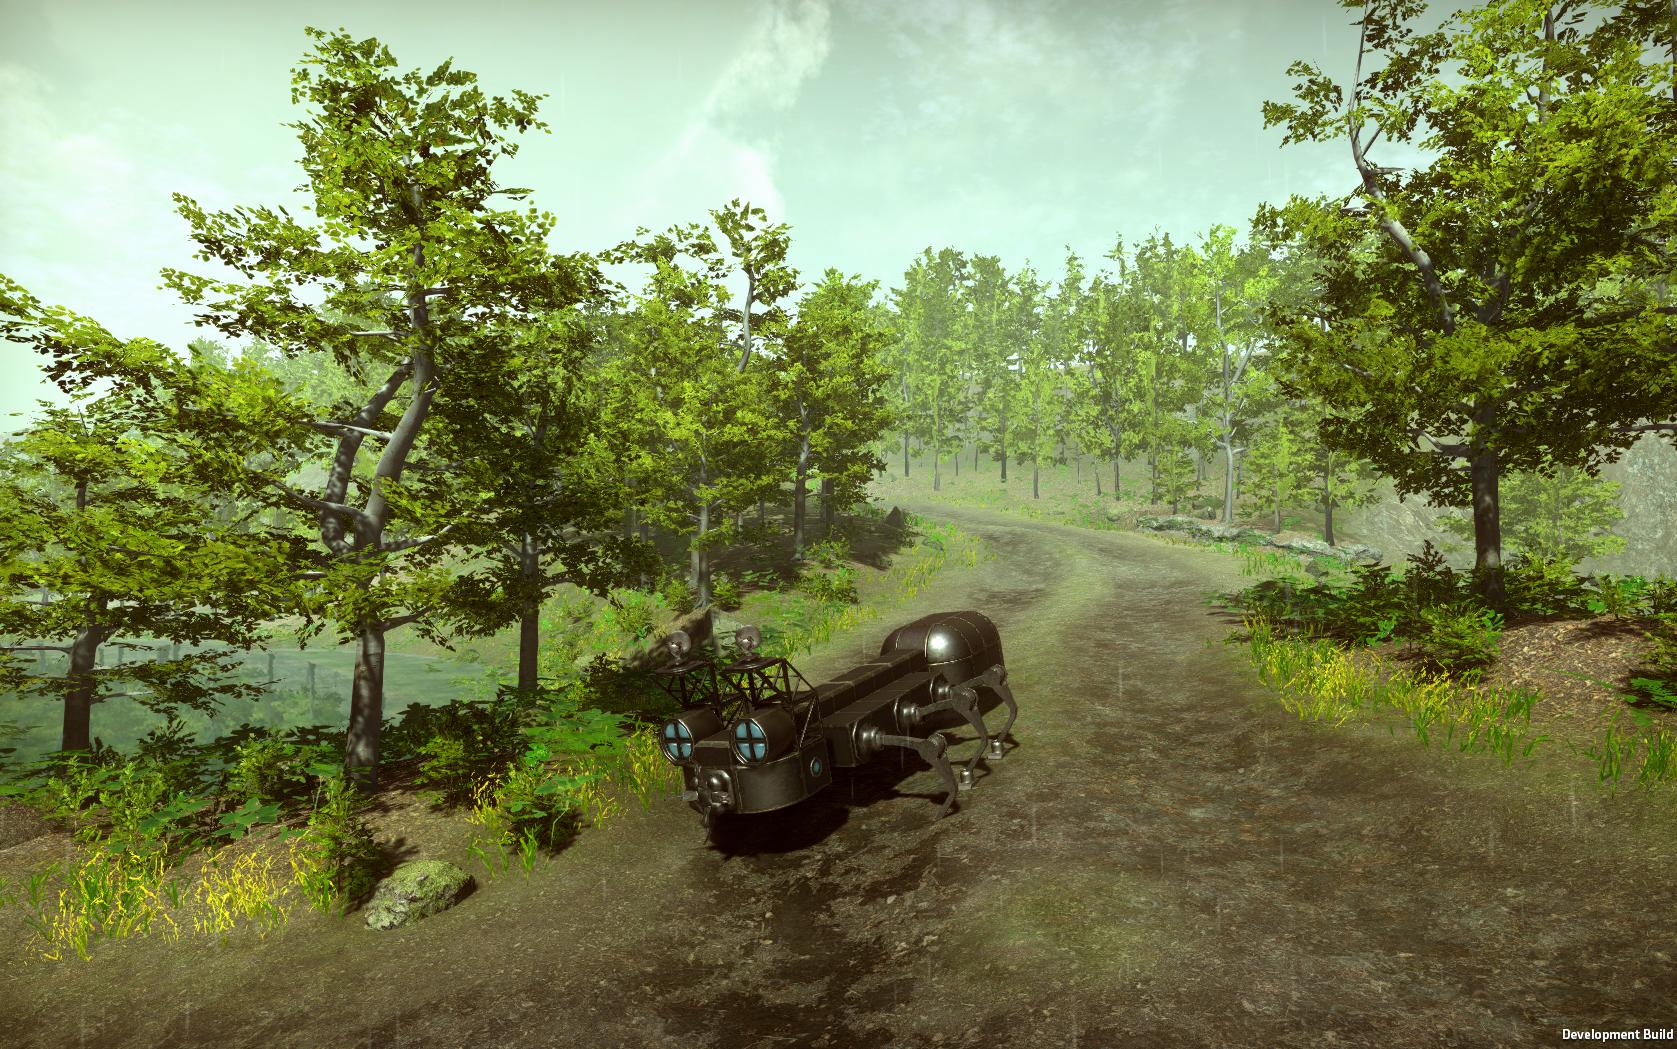 Black Ant vehicle machine Dieselpunk Wars